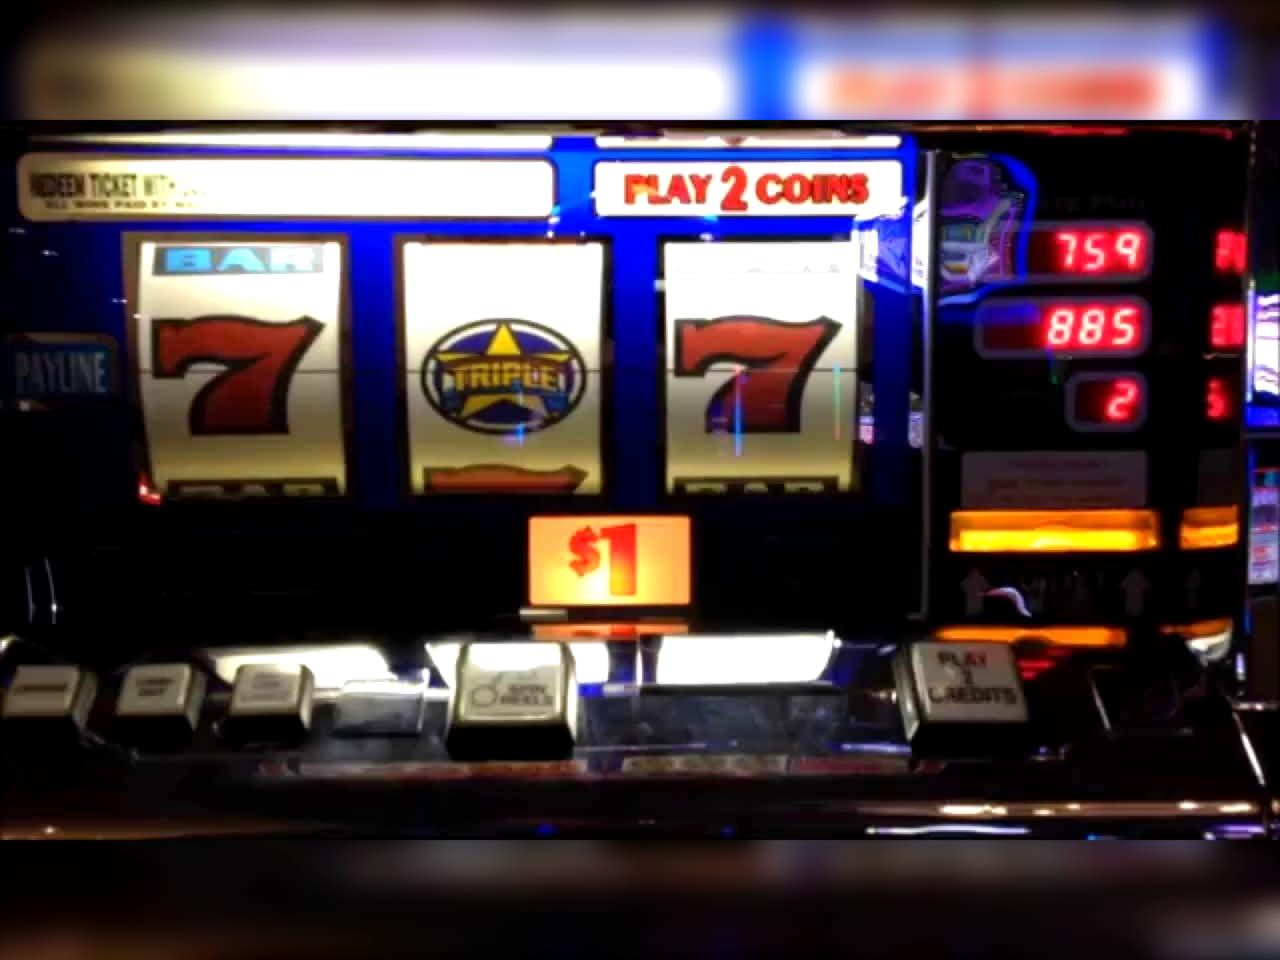 €4350 no deposit bonus at Slotty Dubai Casino